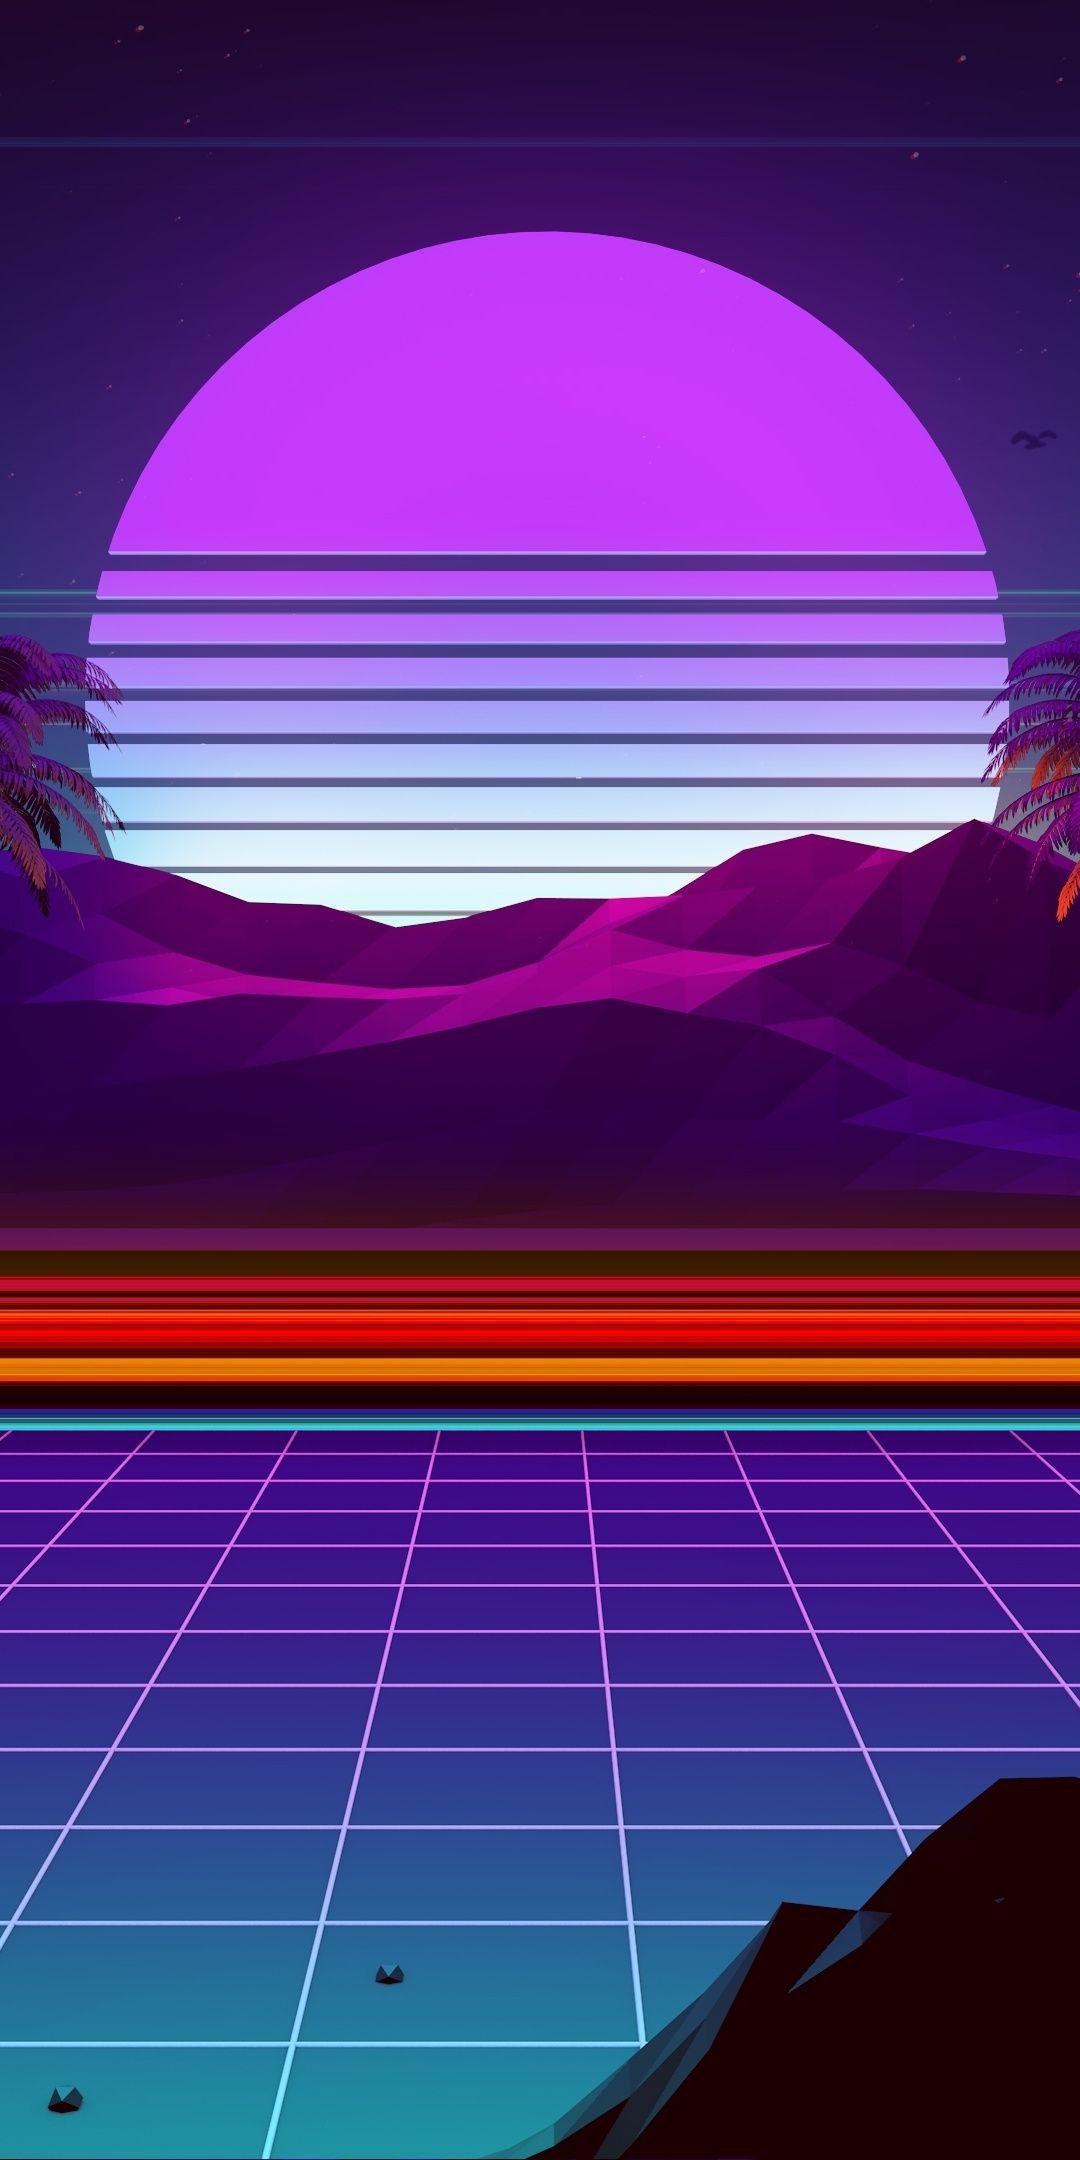 1080x2160 Night Moonlight Mountain Synthwave And Retrowave Digital Art Wallpaper Neon Artwork Vaporwave Wallpaper Retro Wallpaper